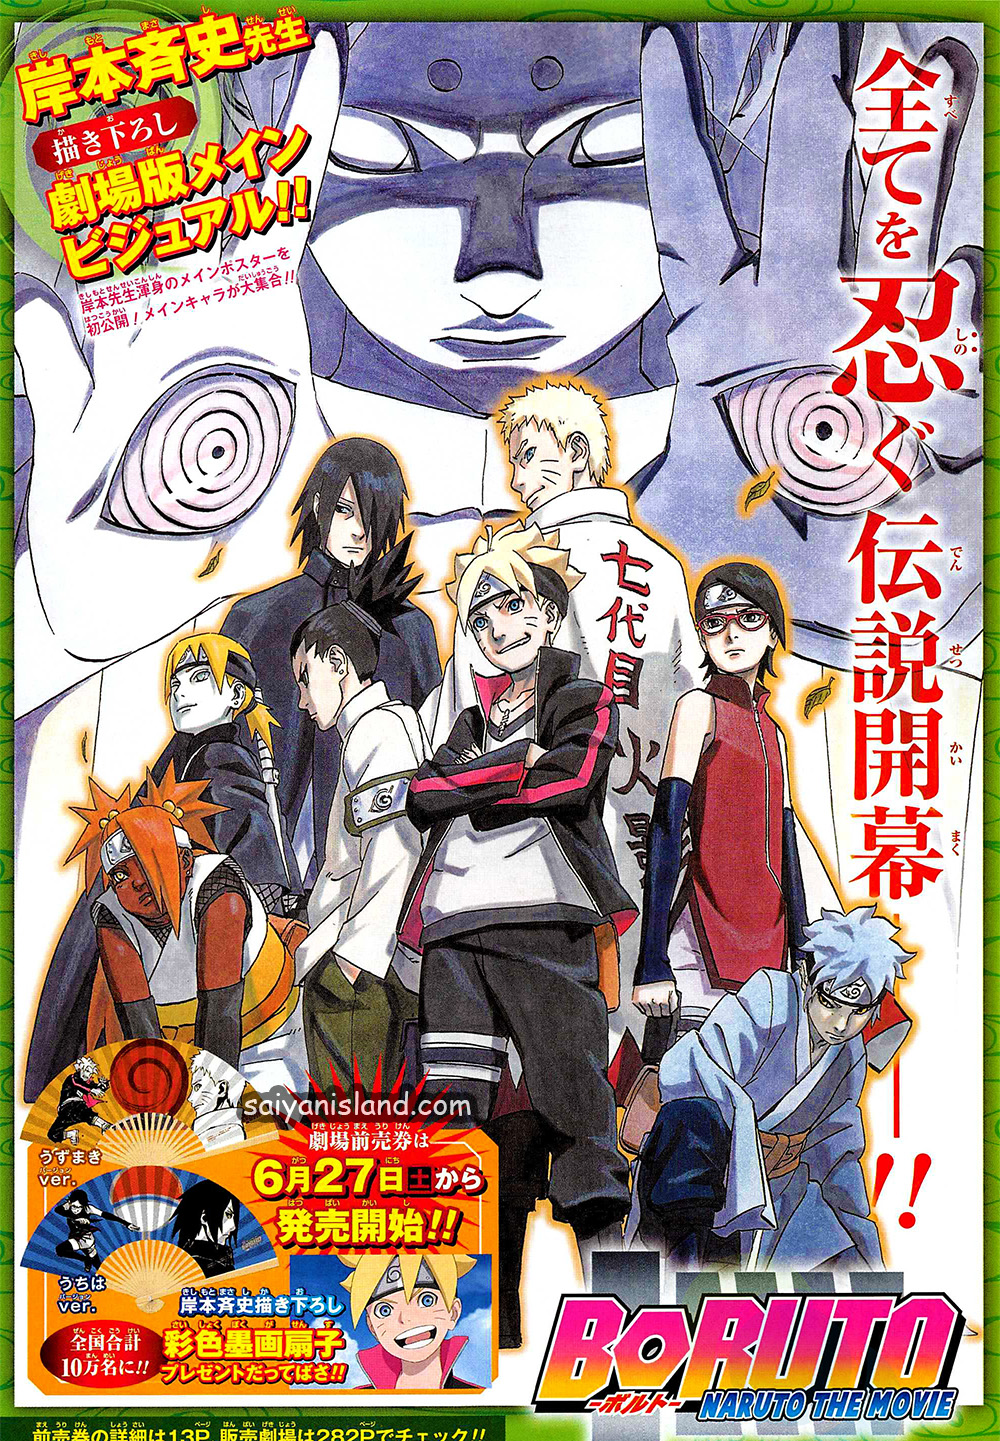 Title Boruto Naruto The Movie 2015 Release Date 7 August Japan Publish Doktermovieblogspot Genre Animation Action Adventure